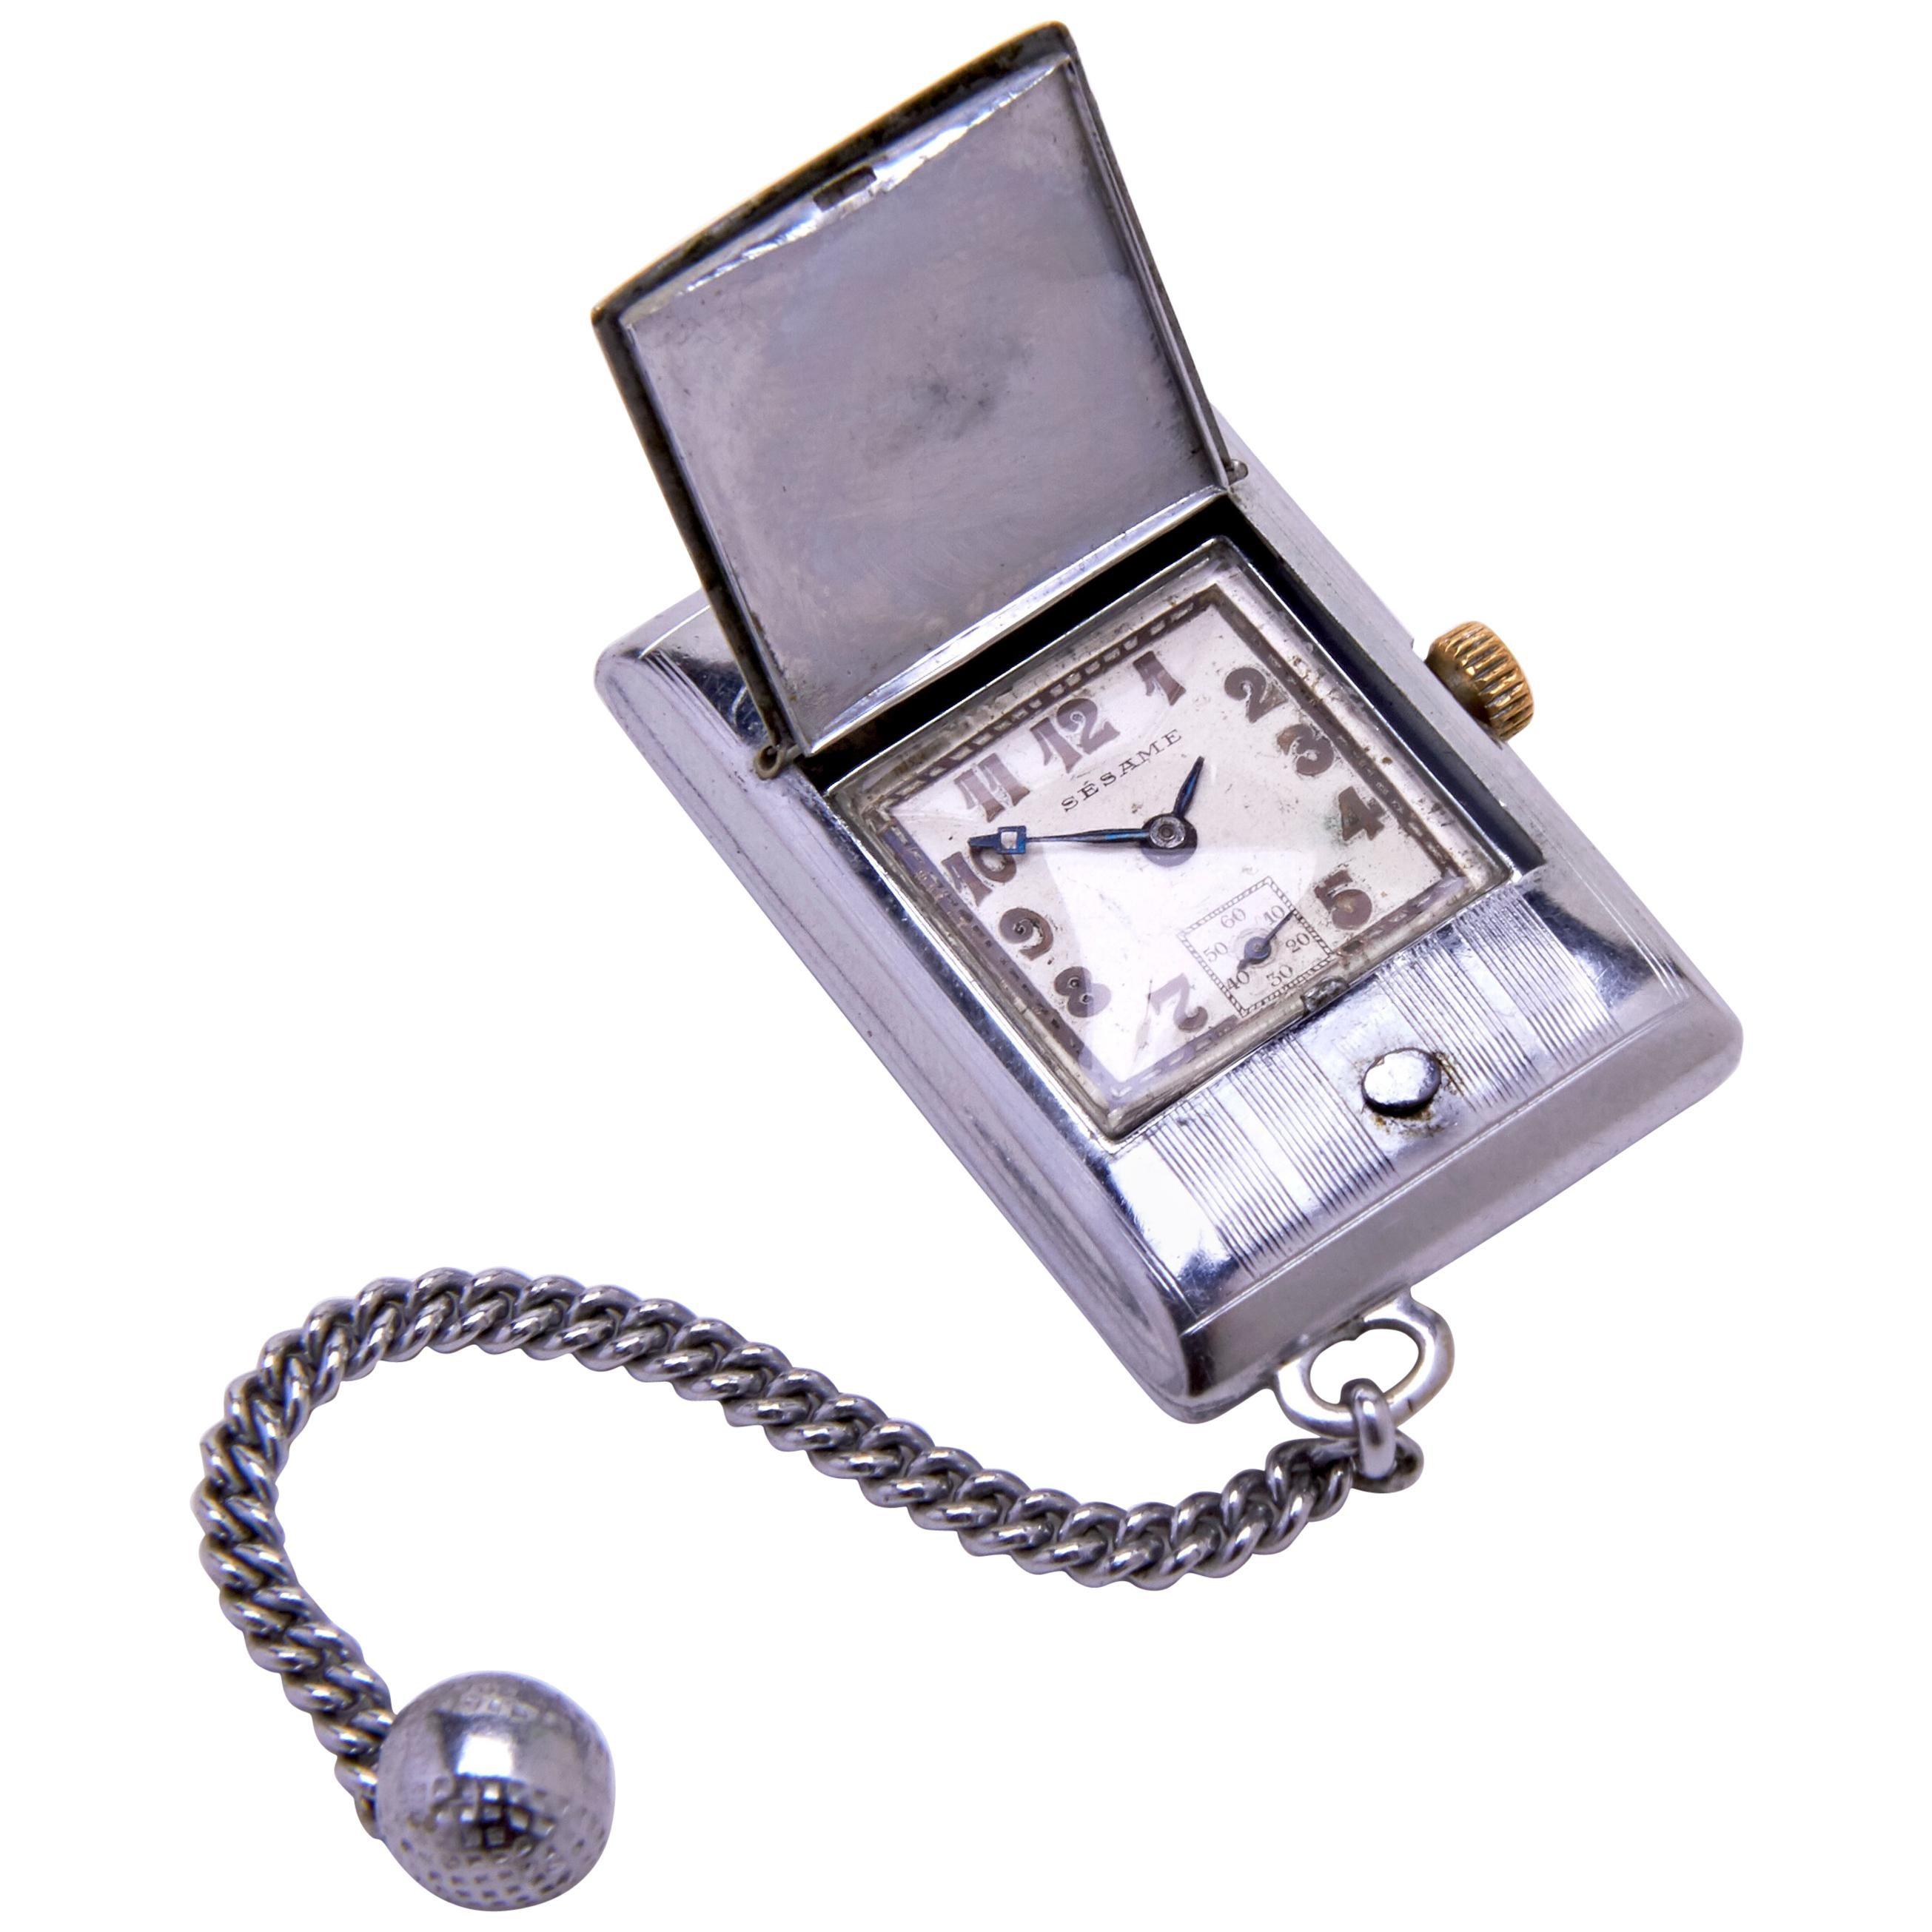 French Art Deco Chrome Plated Golf Bag/ Purse/ Pocket Watch Signed Sesame